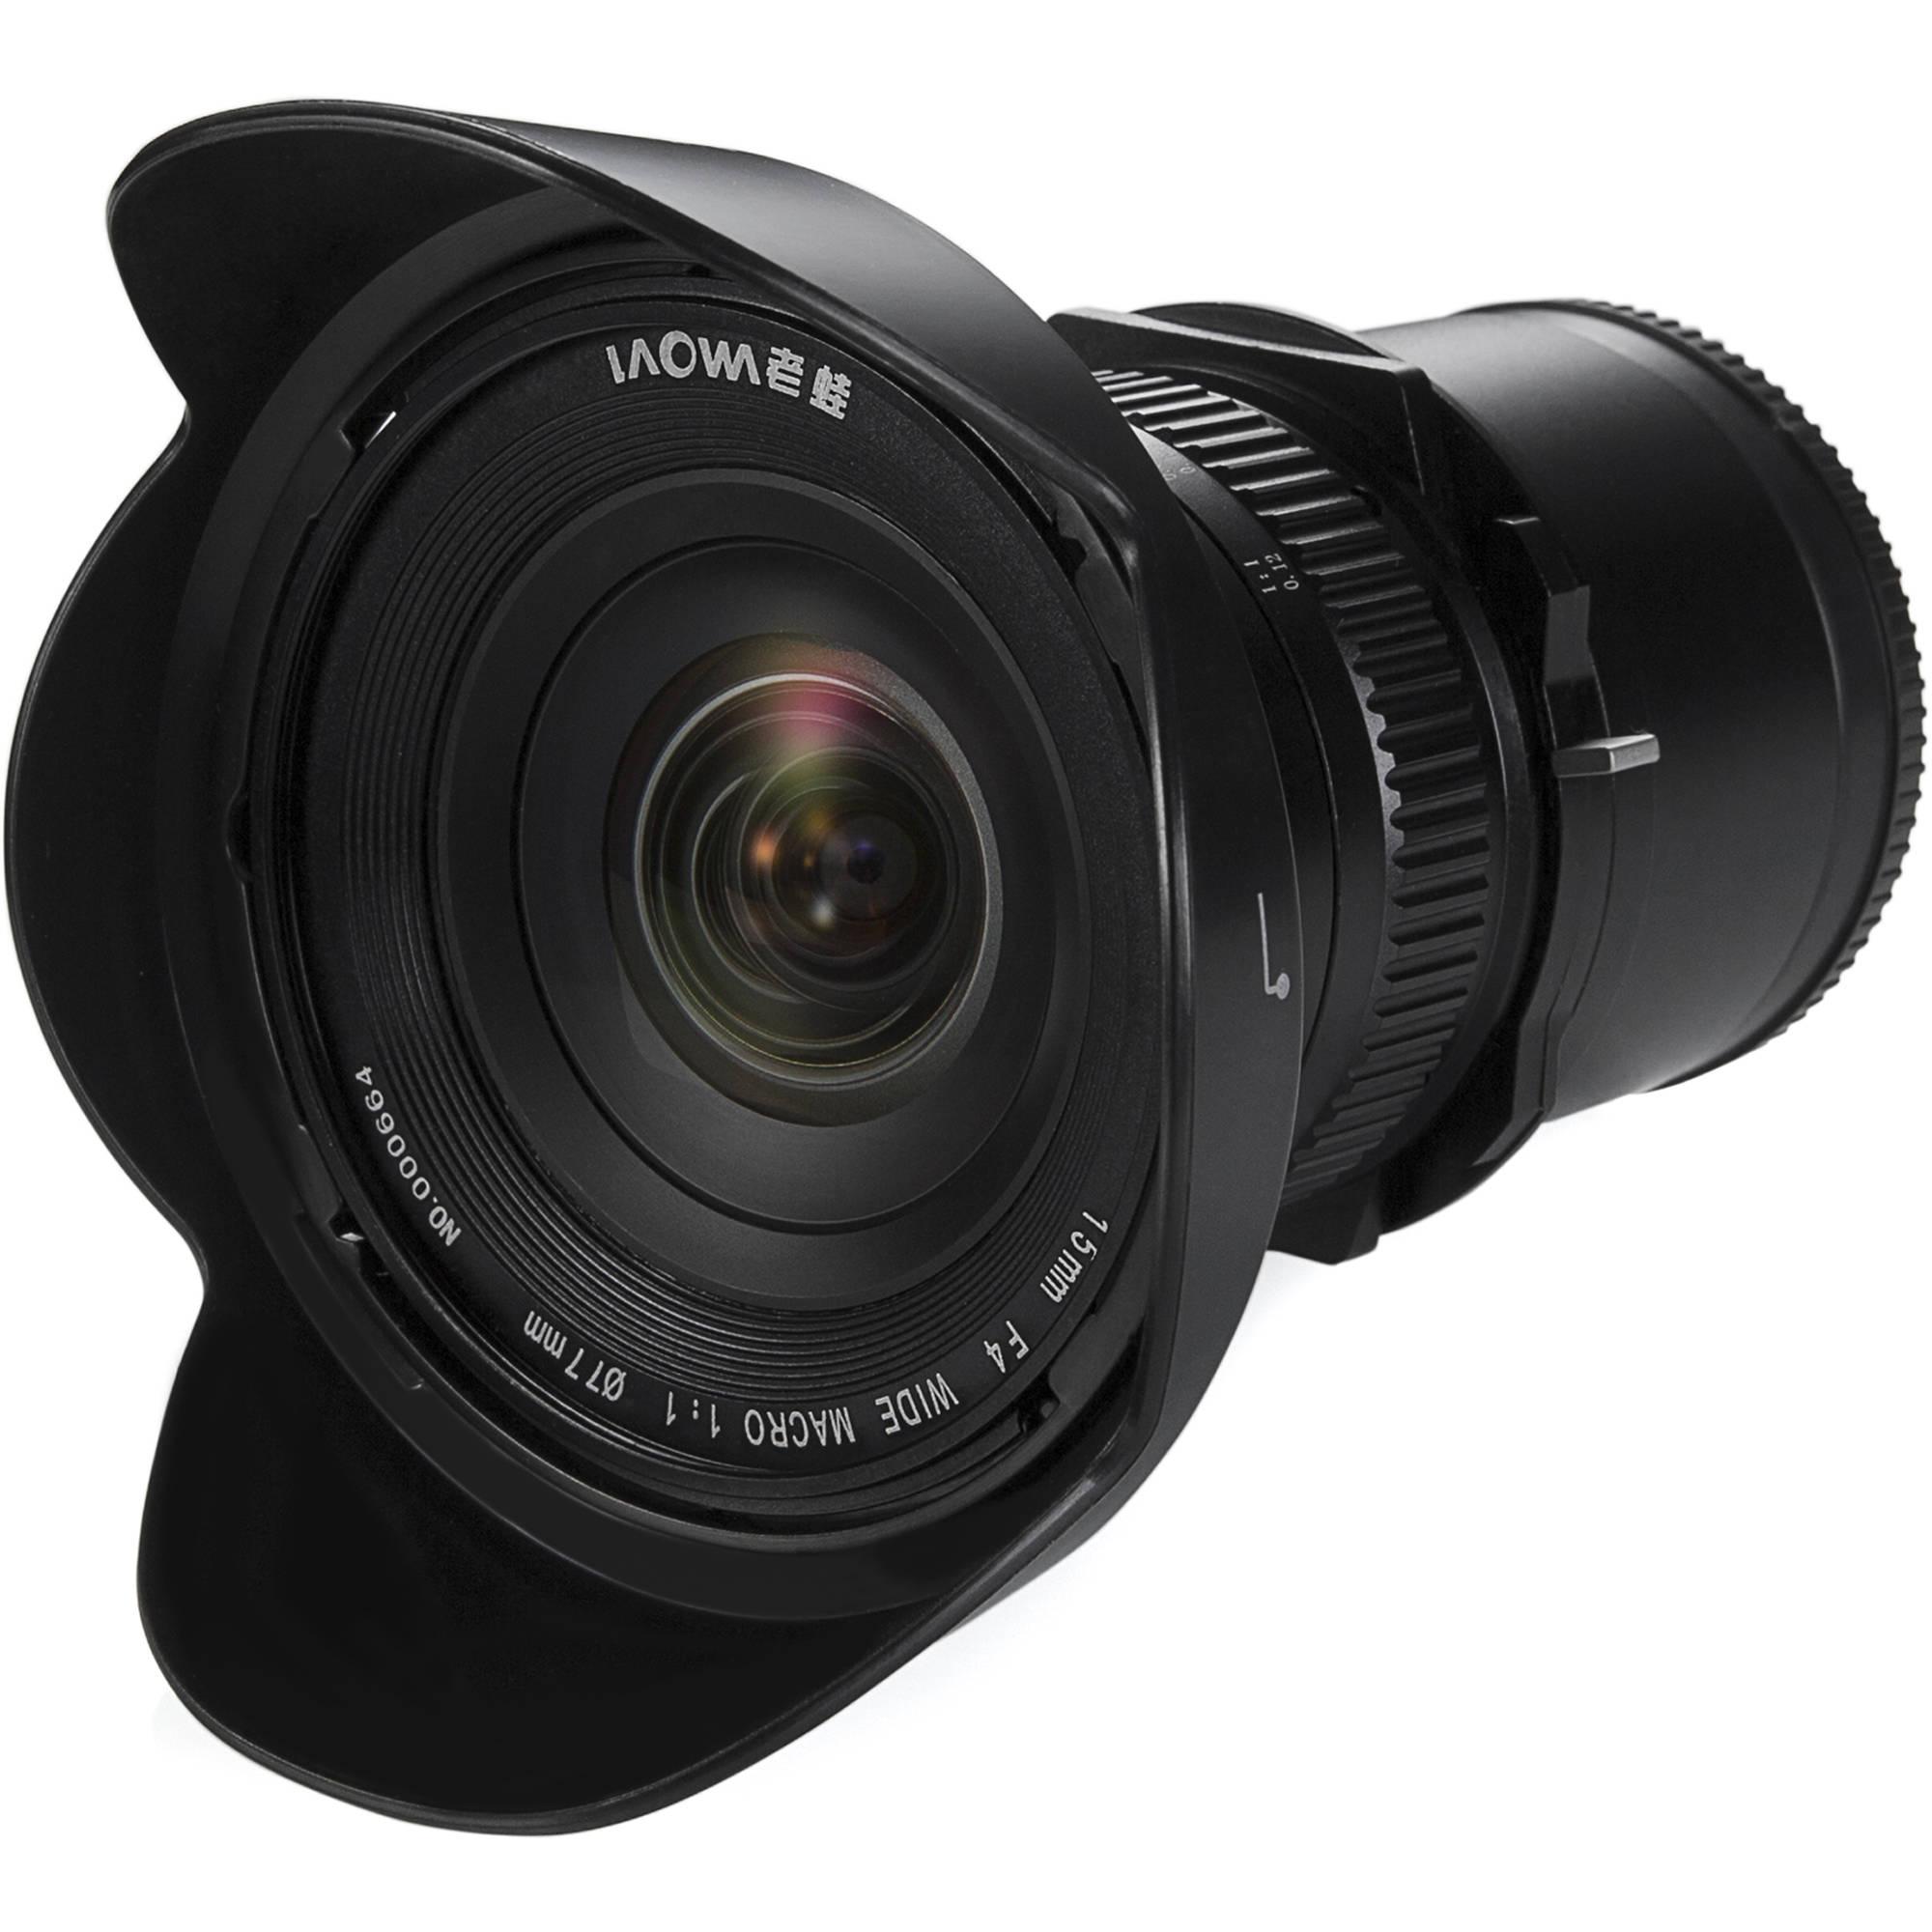 Venus Optics Laowa 15mm f/4 Macro Lens for Sony E VE1540SFE B&H